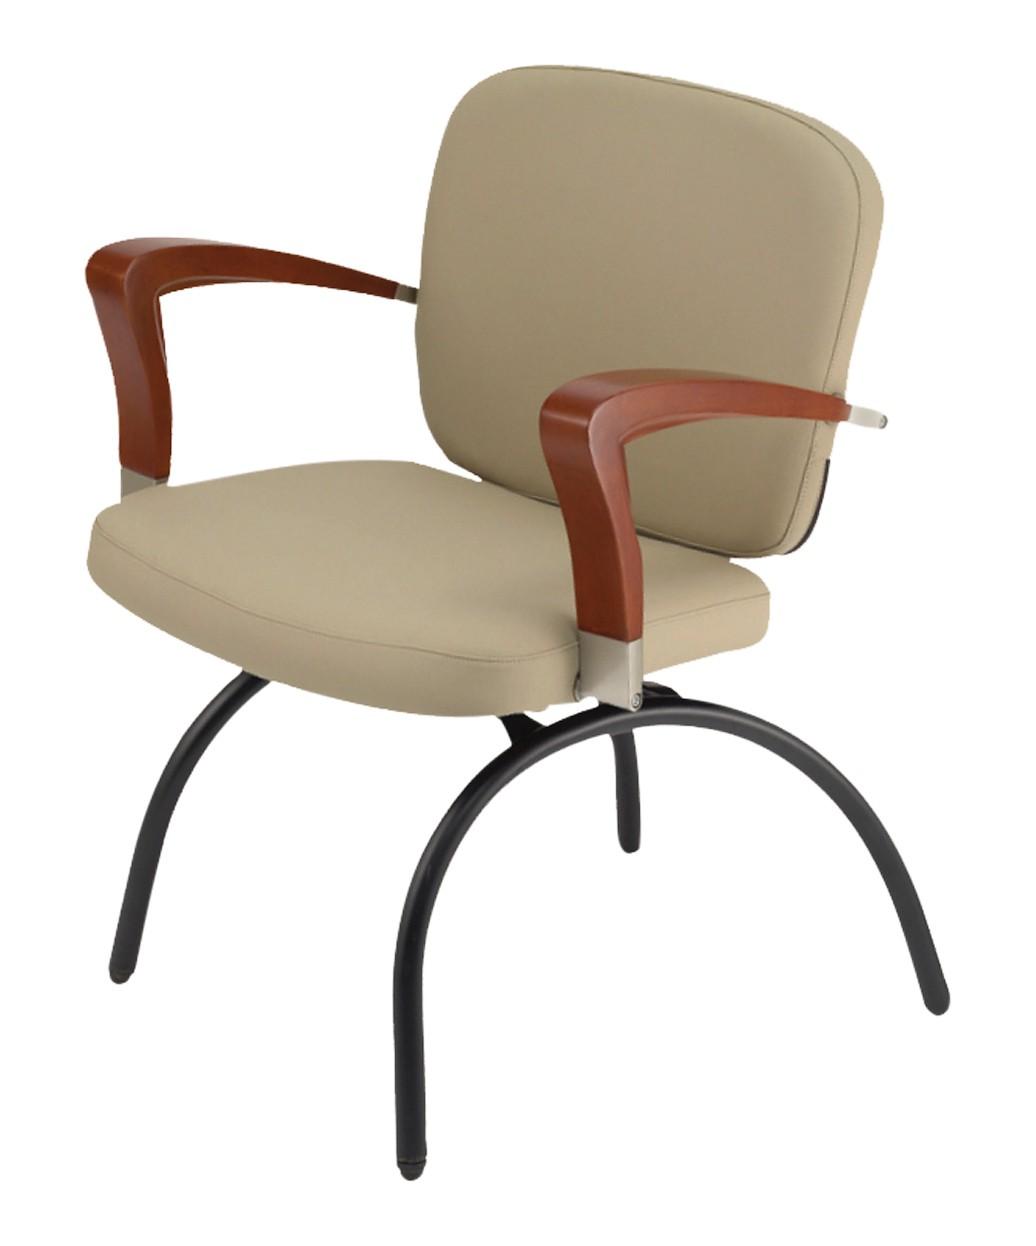 Pibbs 3820 Verona Reception Chair